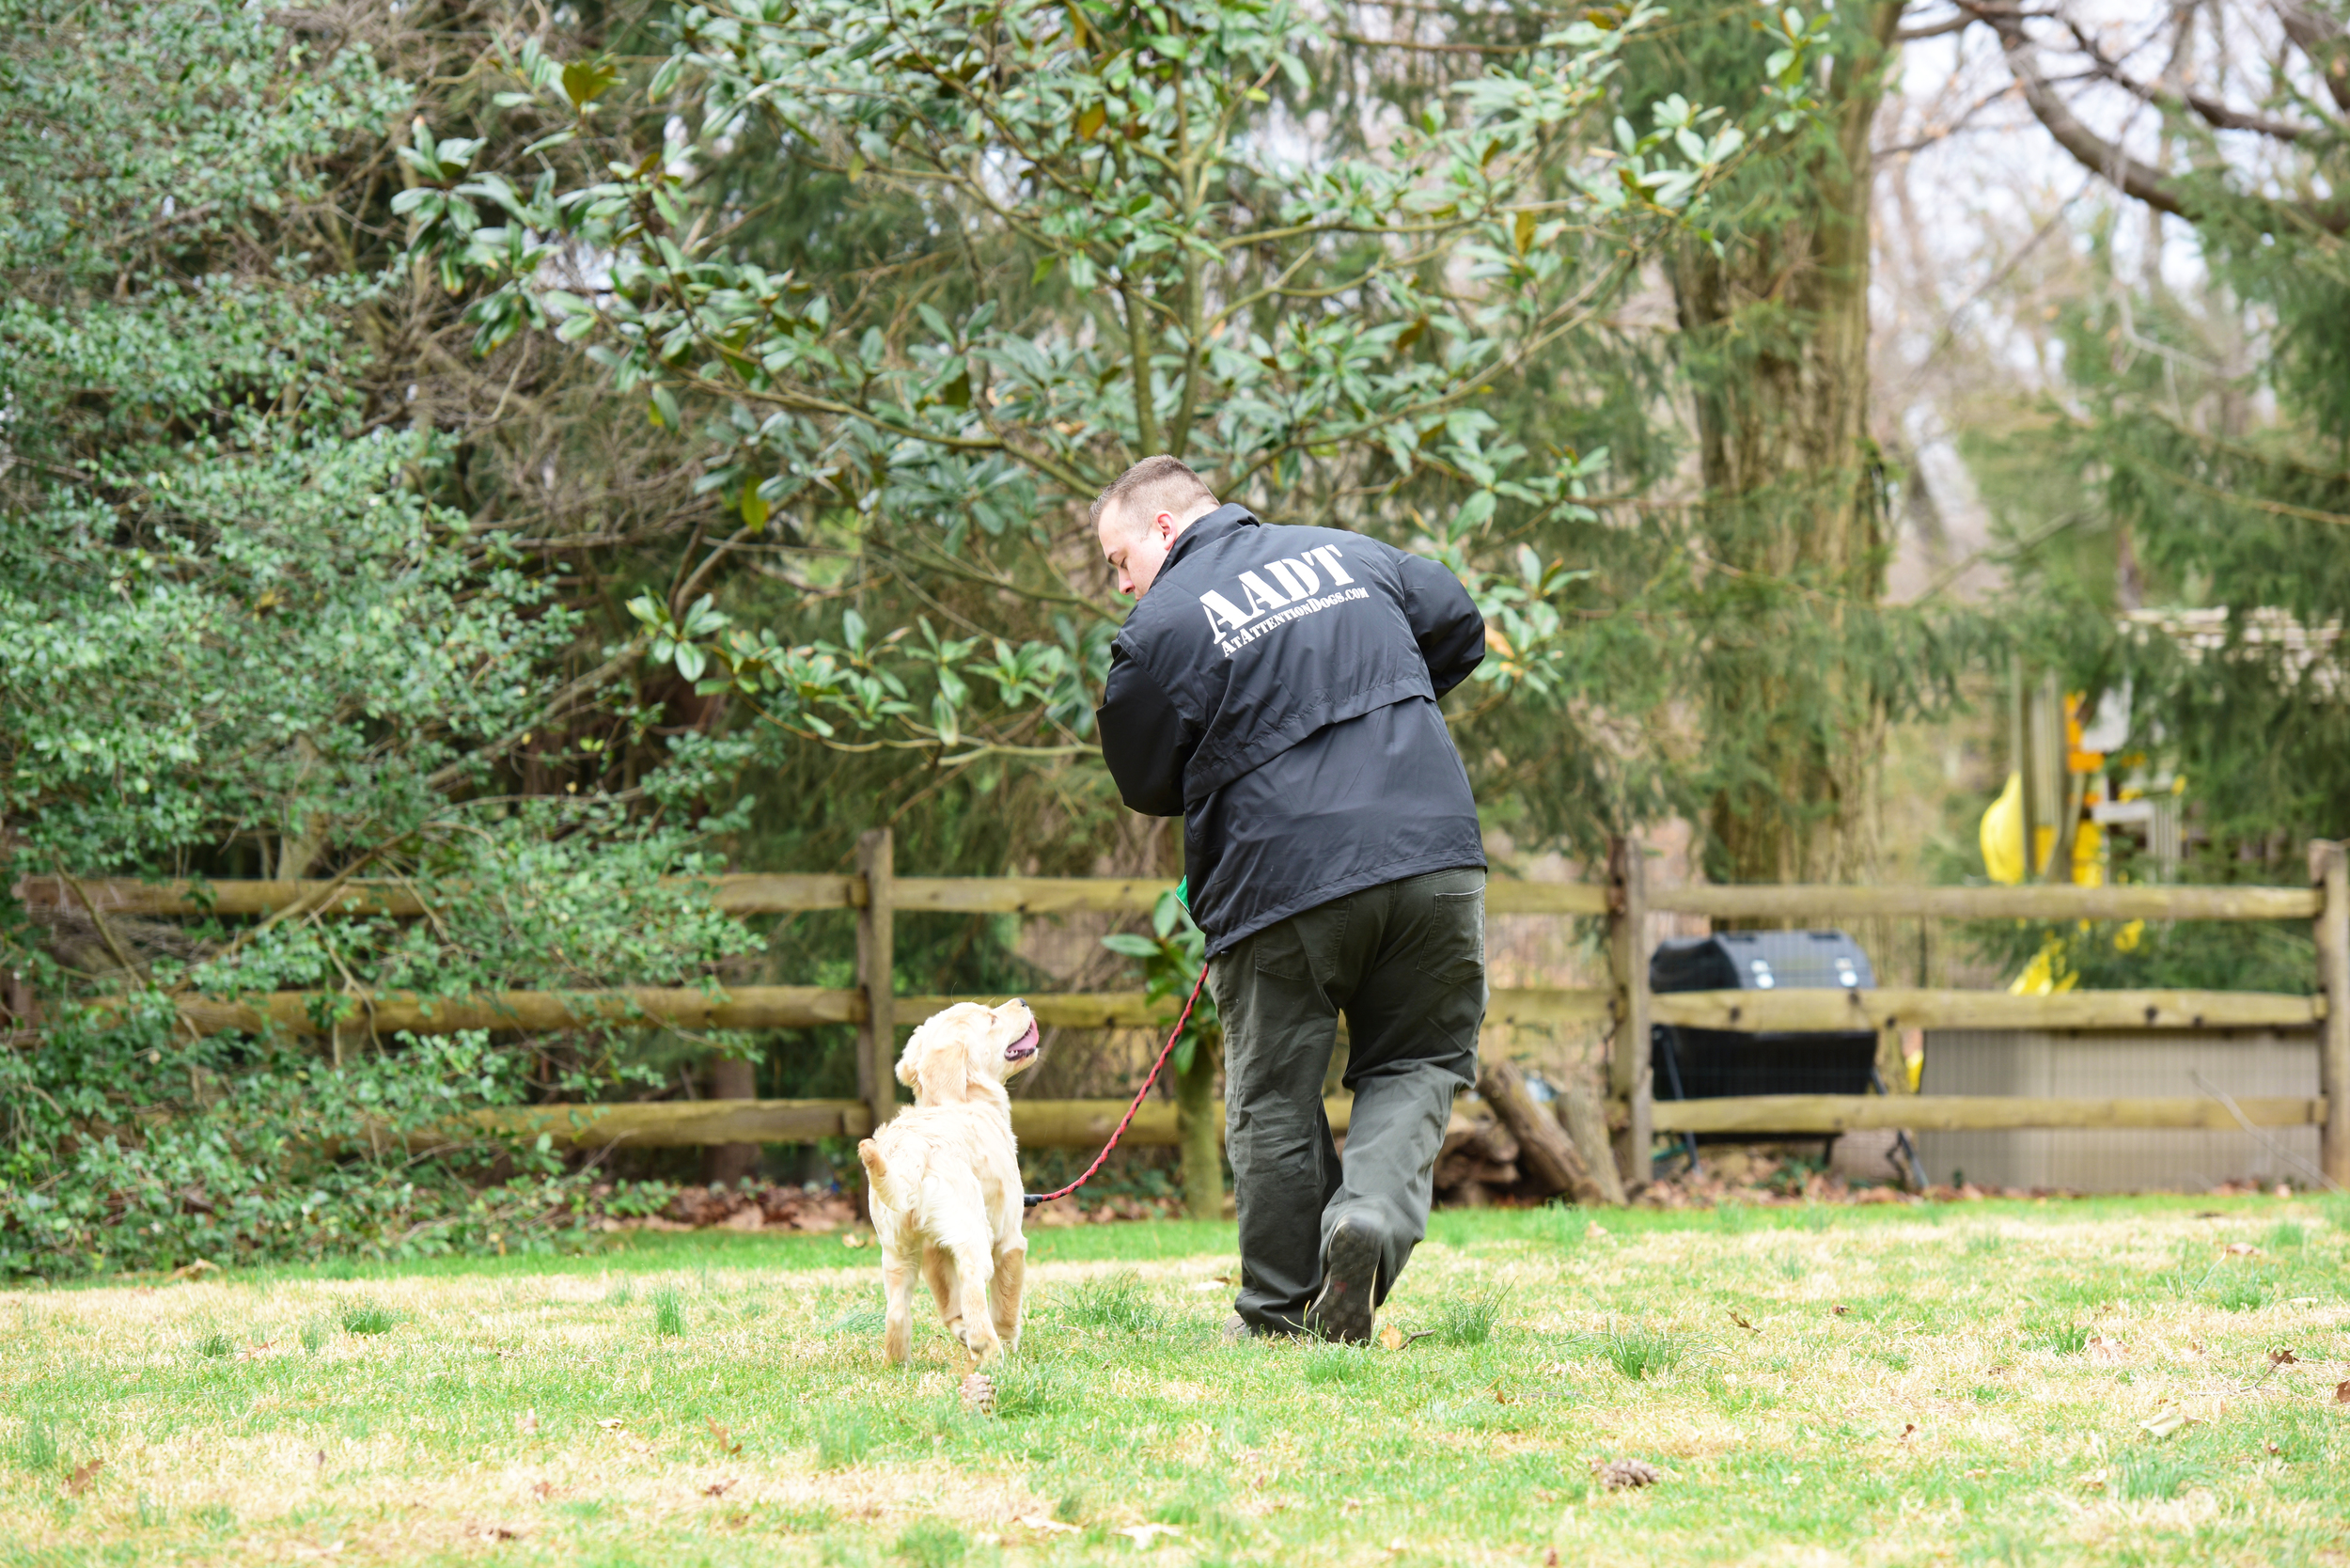 Dog Trainer, Gladwyne, Main Line, Positive, At Attention Dog Training - 2